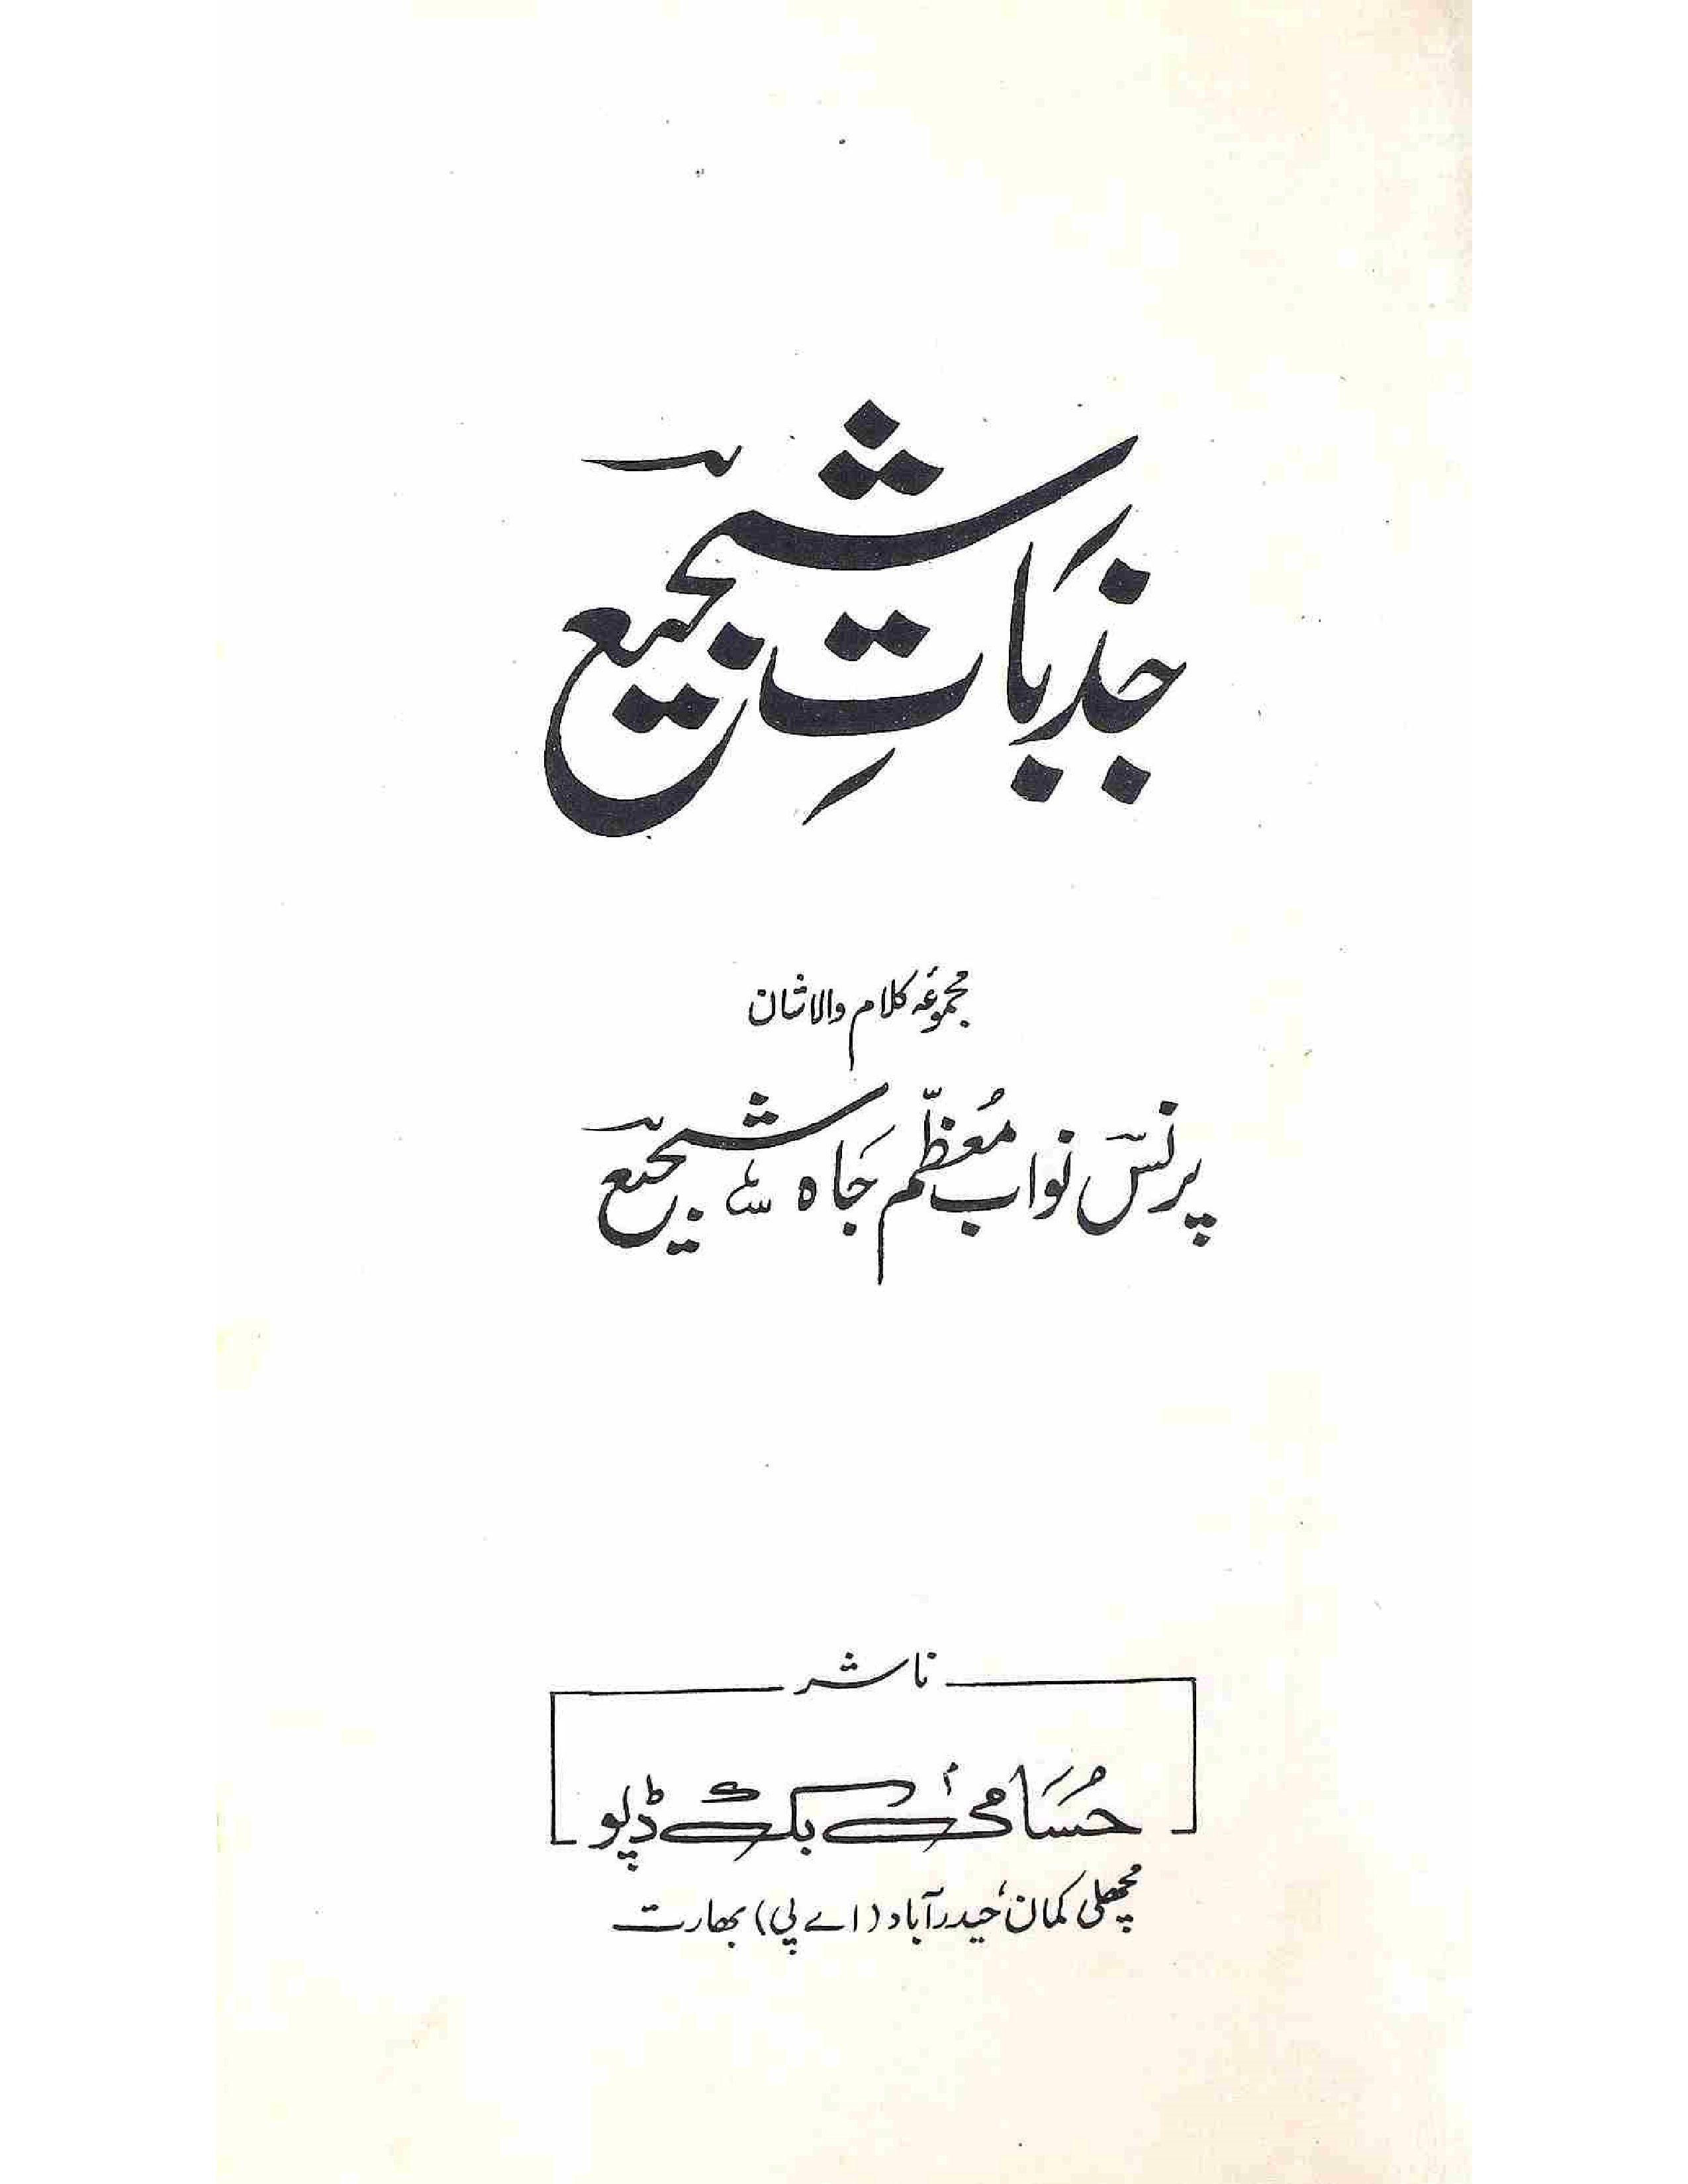 Jazbat-e-Shajee